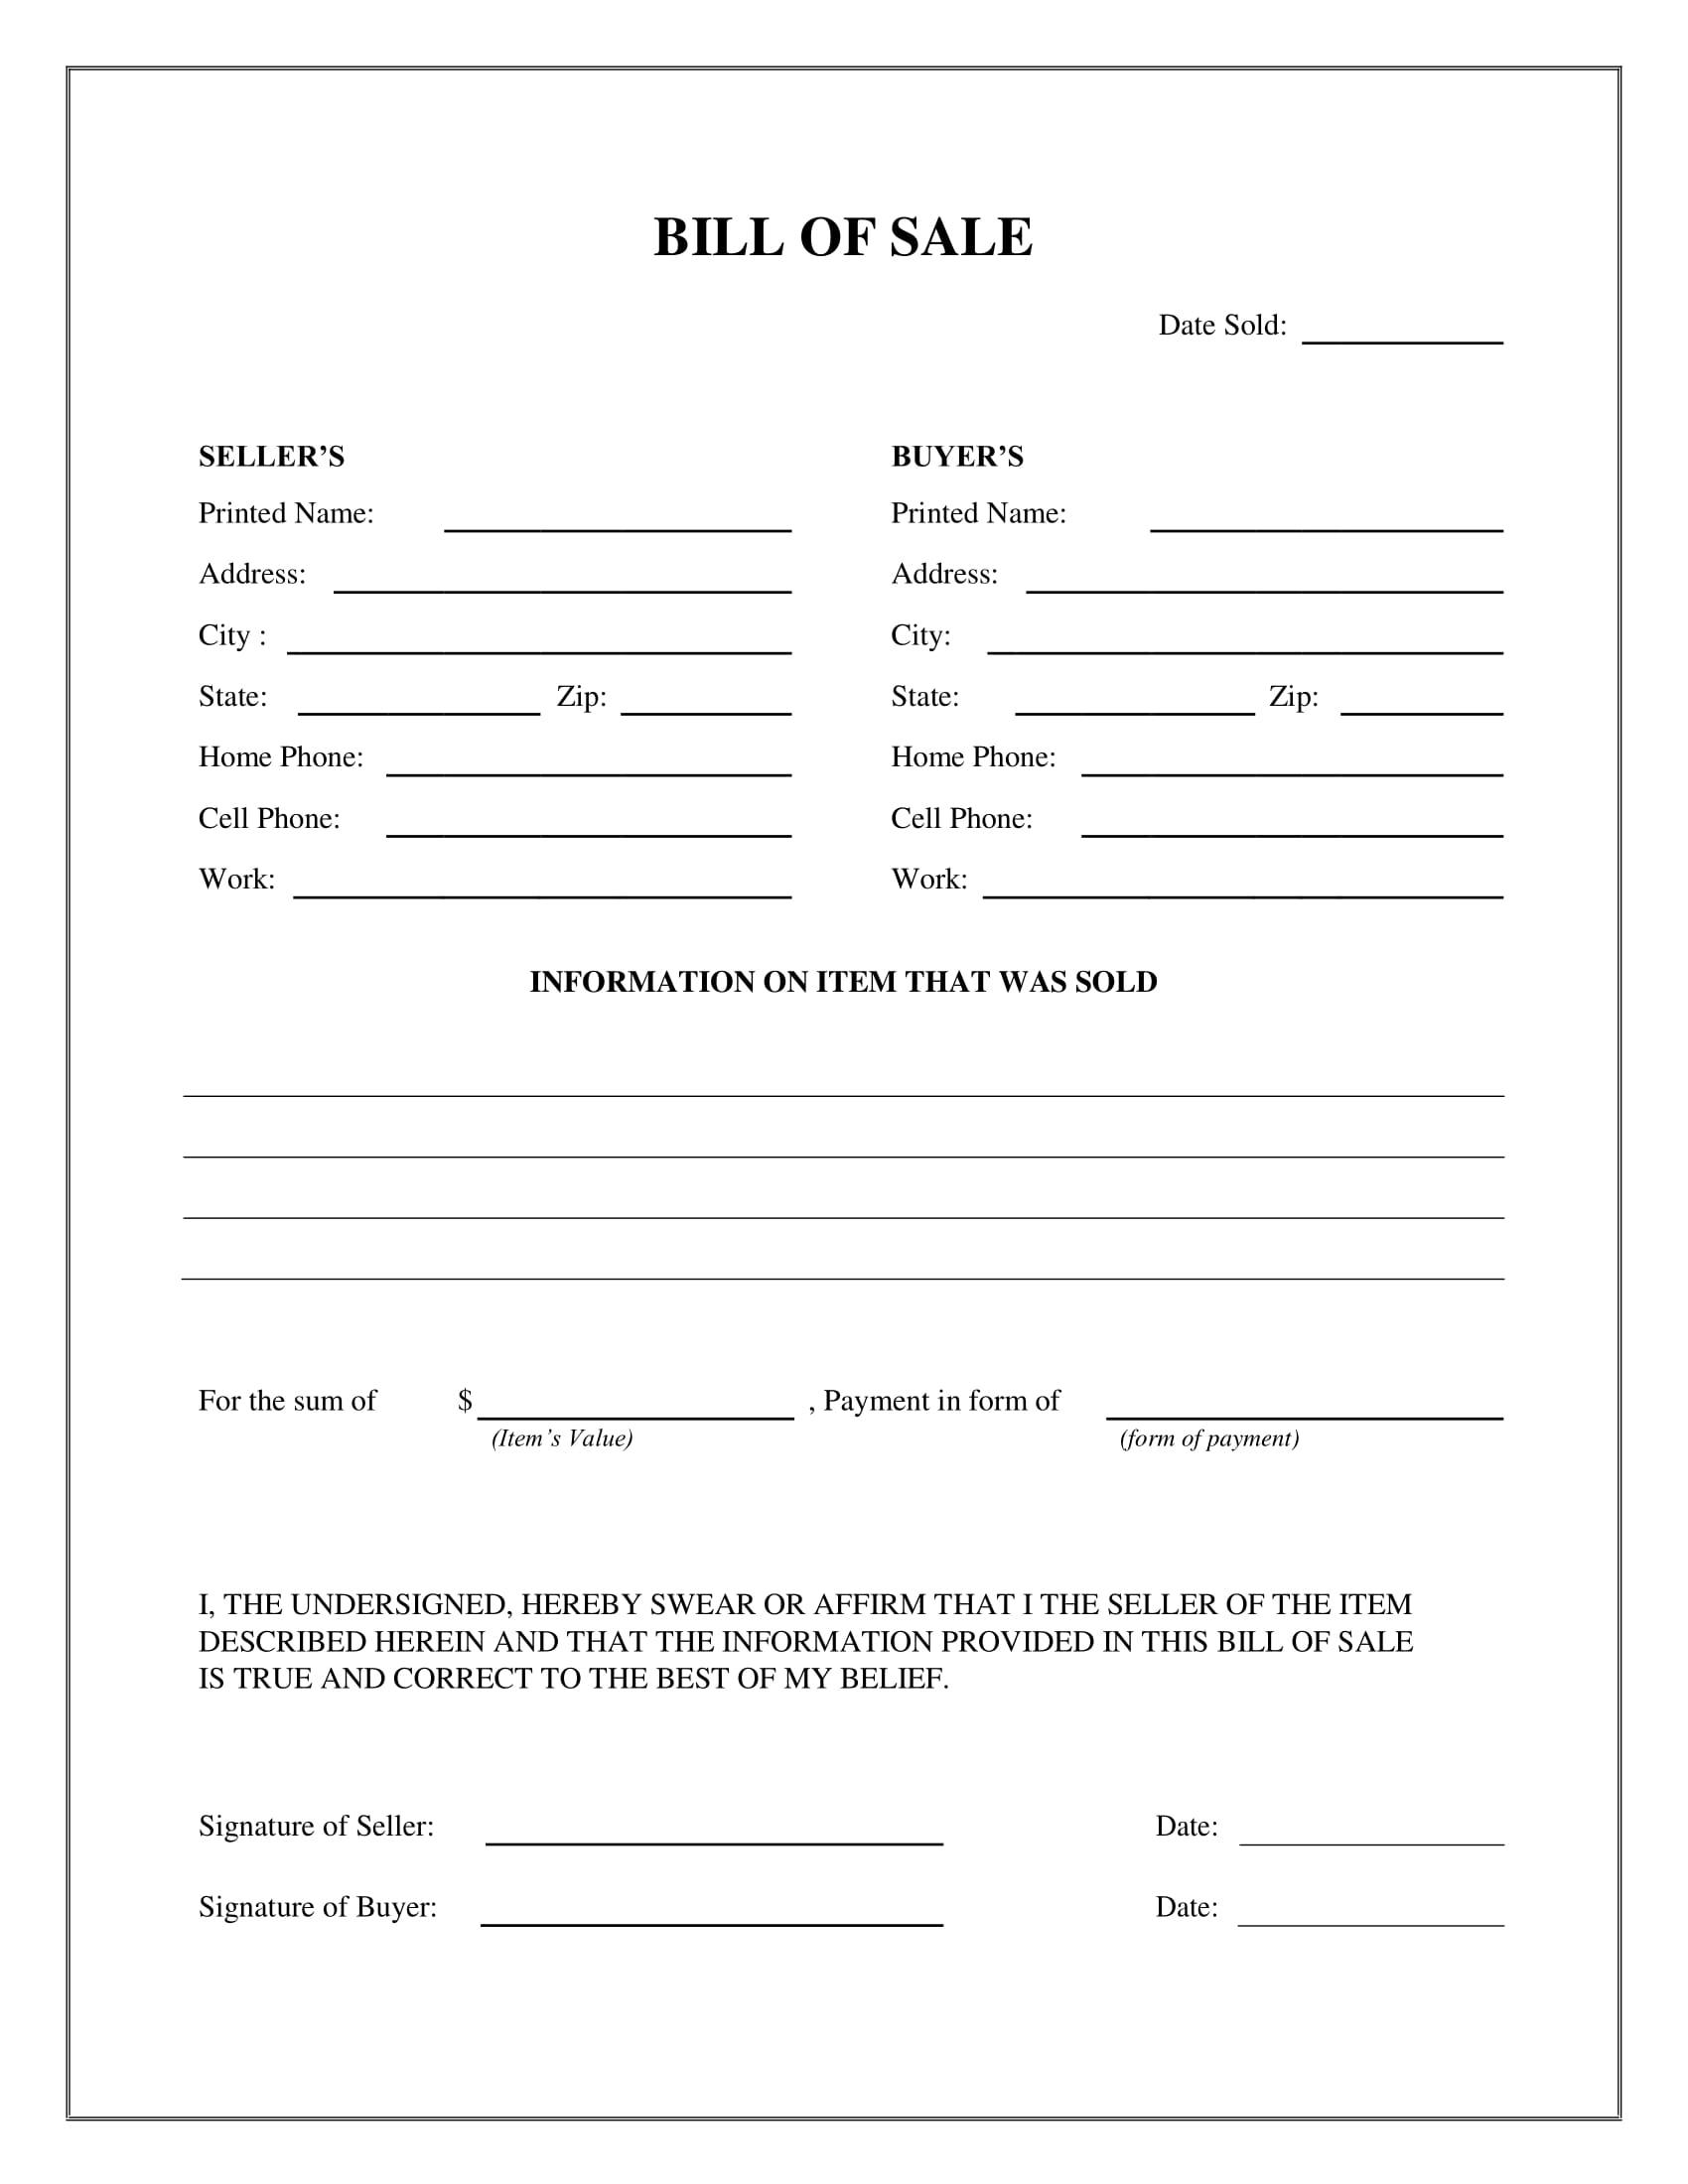 Free Fillable Bill Of Sale Form Pdf Templates Bill of sale template utah